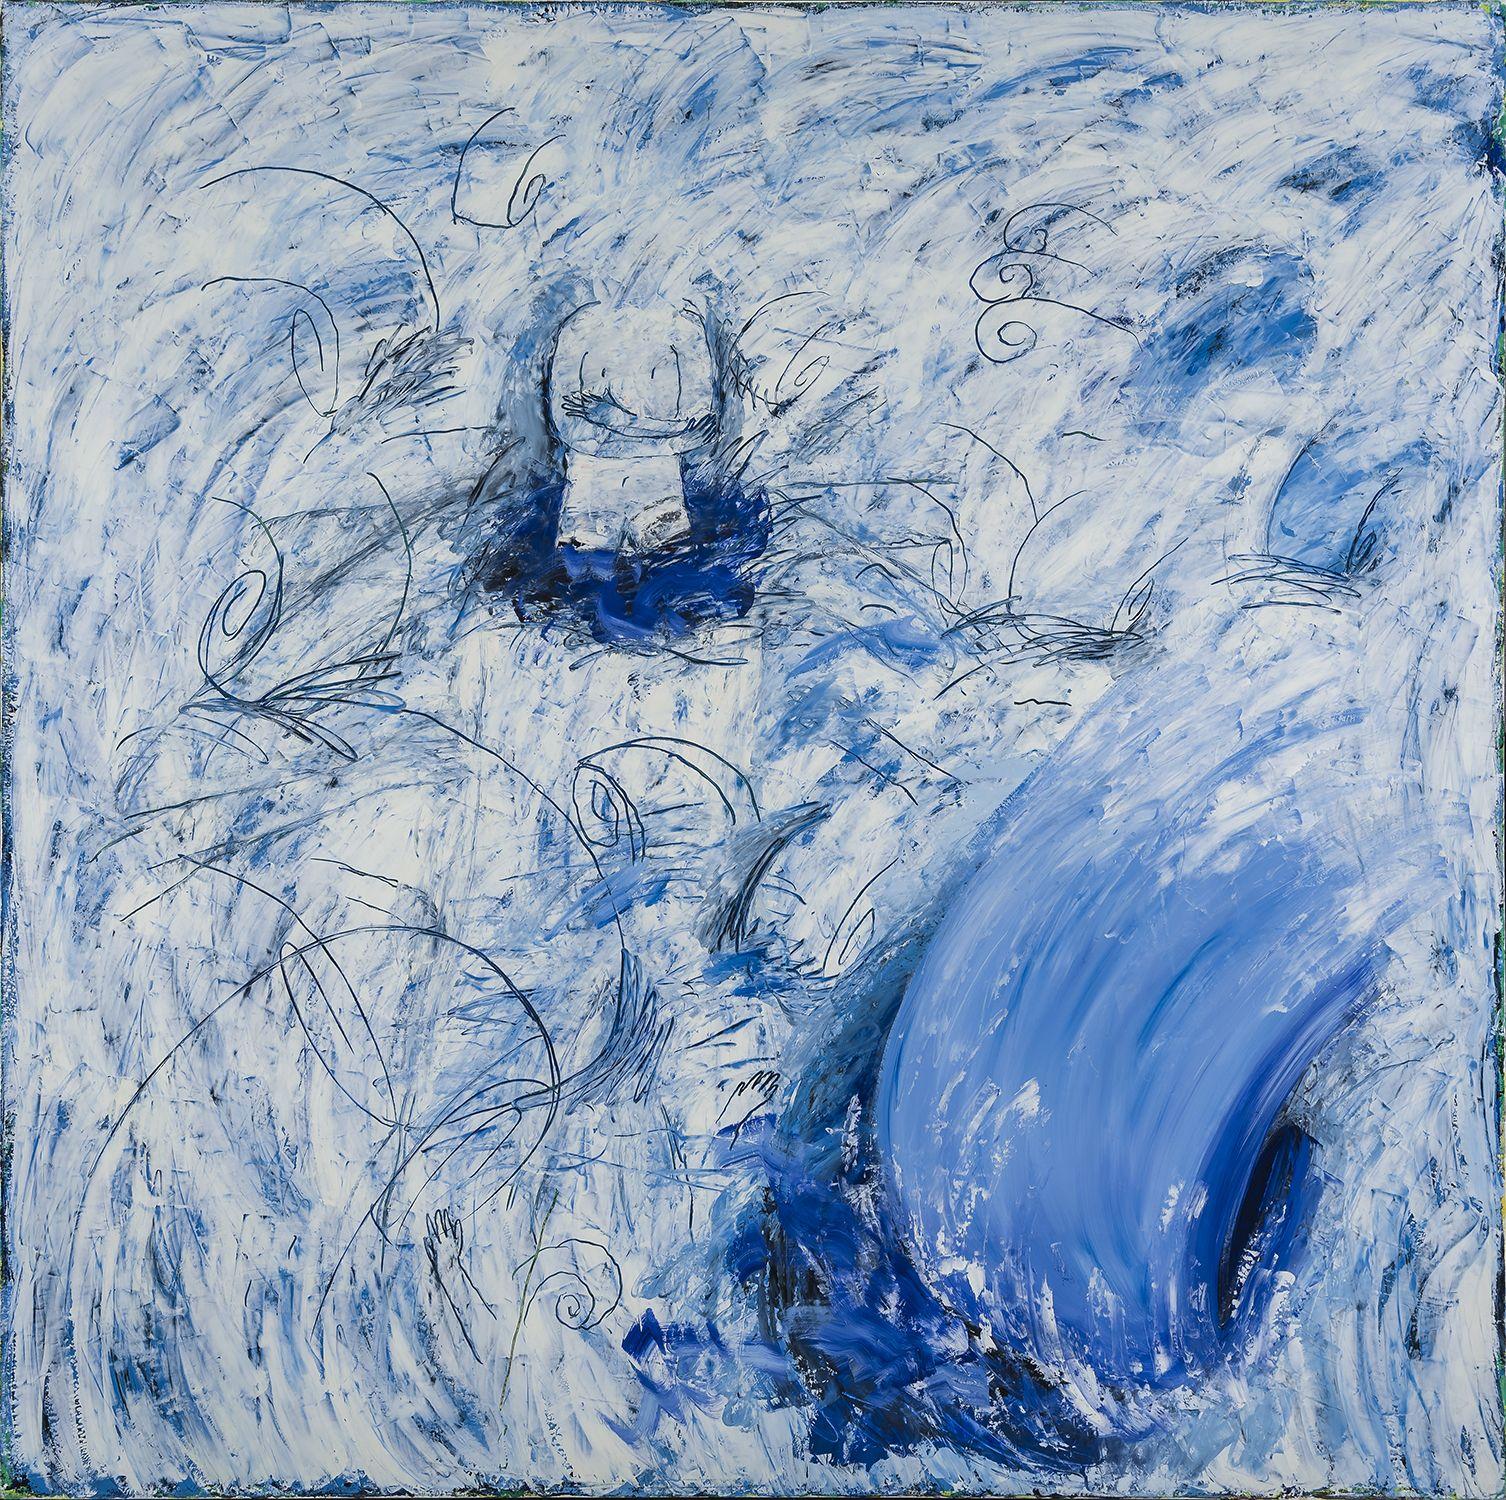 Louisa Chase (1951-2016), Wave, 1982